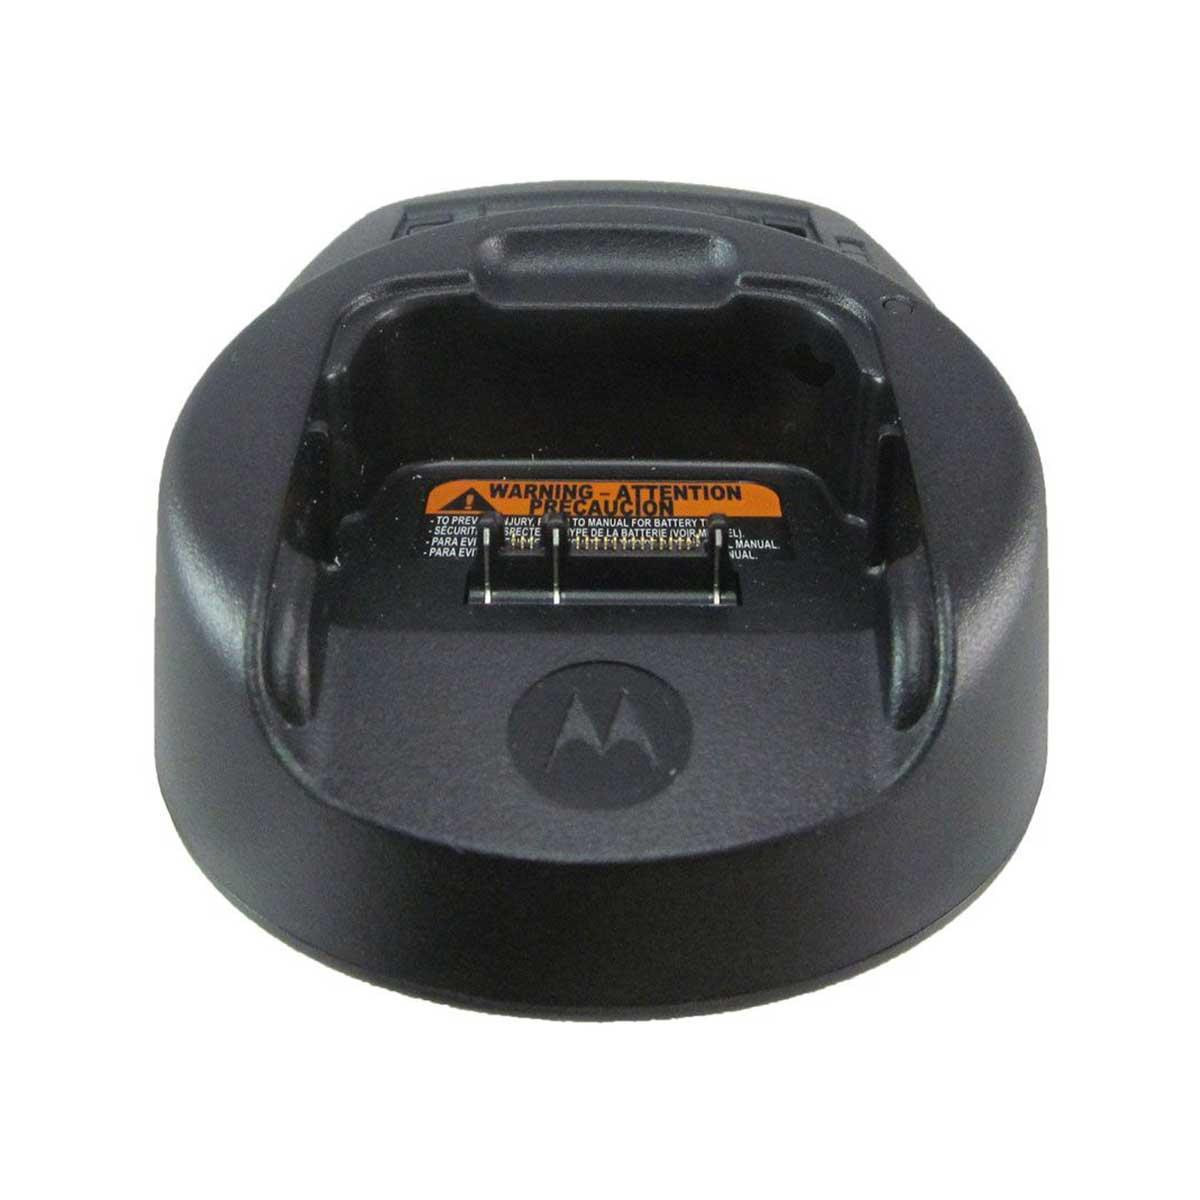 Cargador individual Motorola FTN6575A para radio MTP850